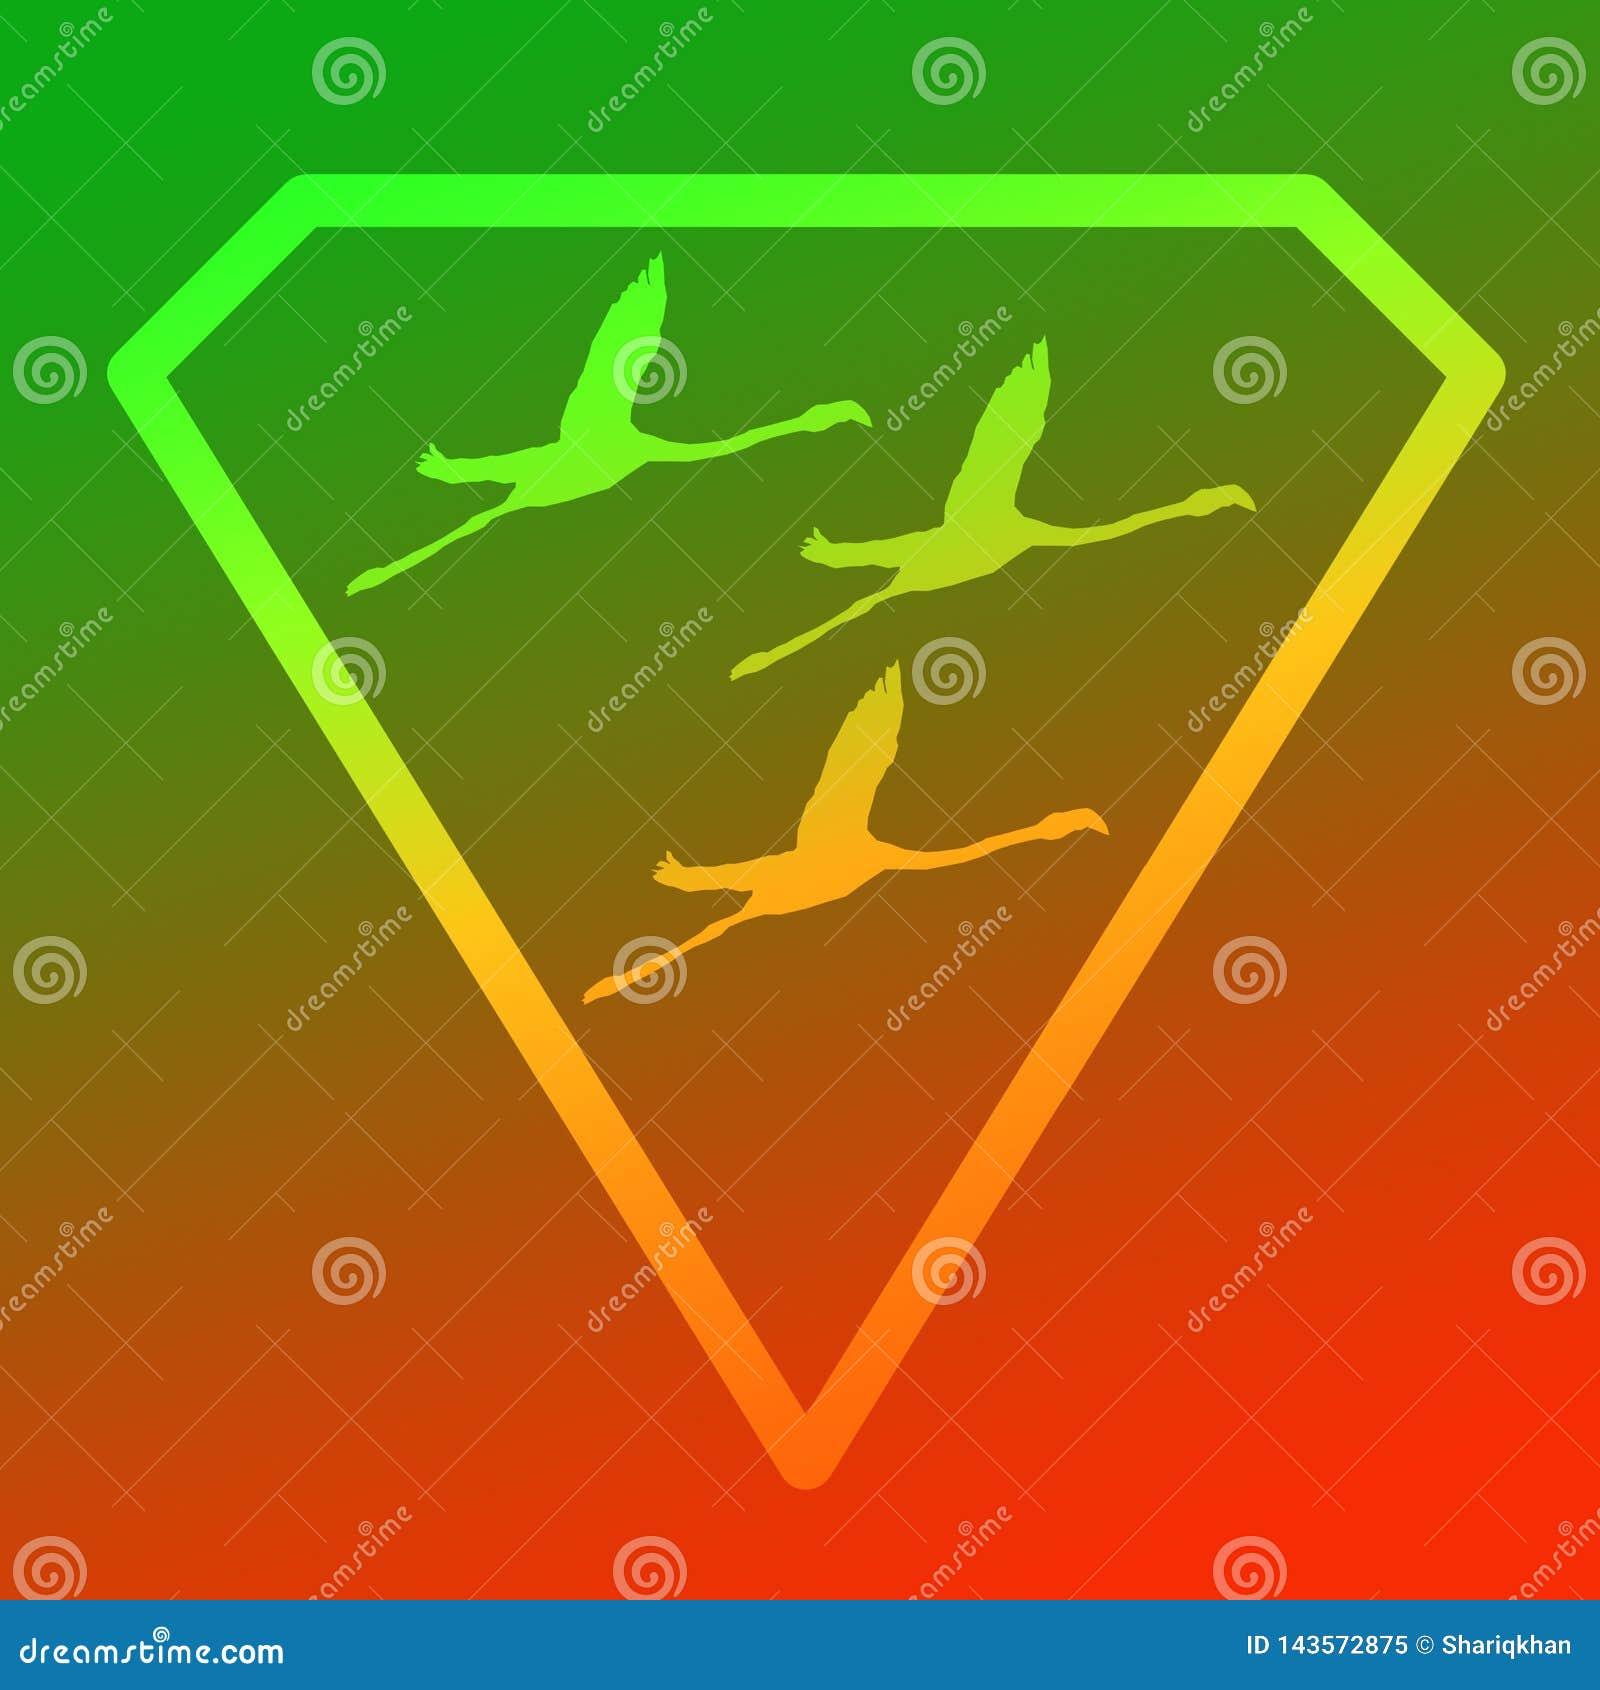 Flamenco de Logo Banner Image Flying Bird en Diamond Shape en fondo anaranjado verde